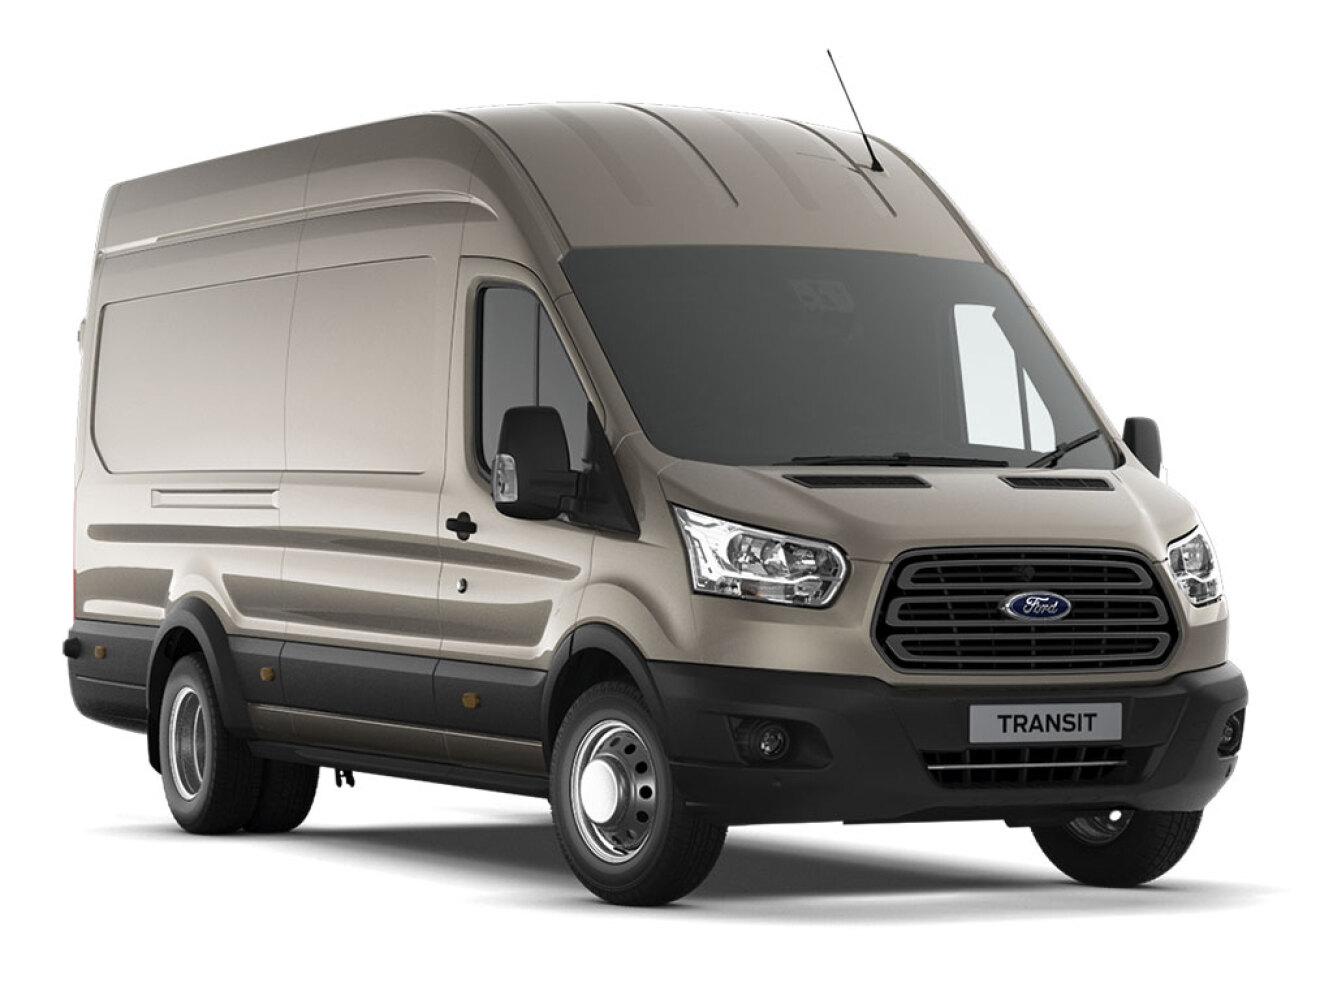 Ford transit 350 l4 diesel rwd 2 0 tdci 170ps h3 heavy duty van